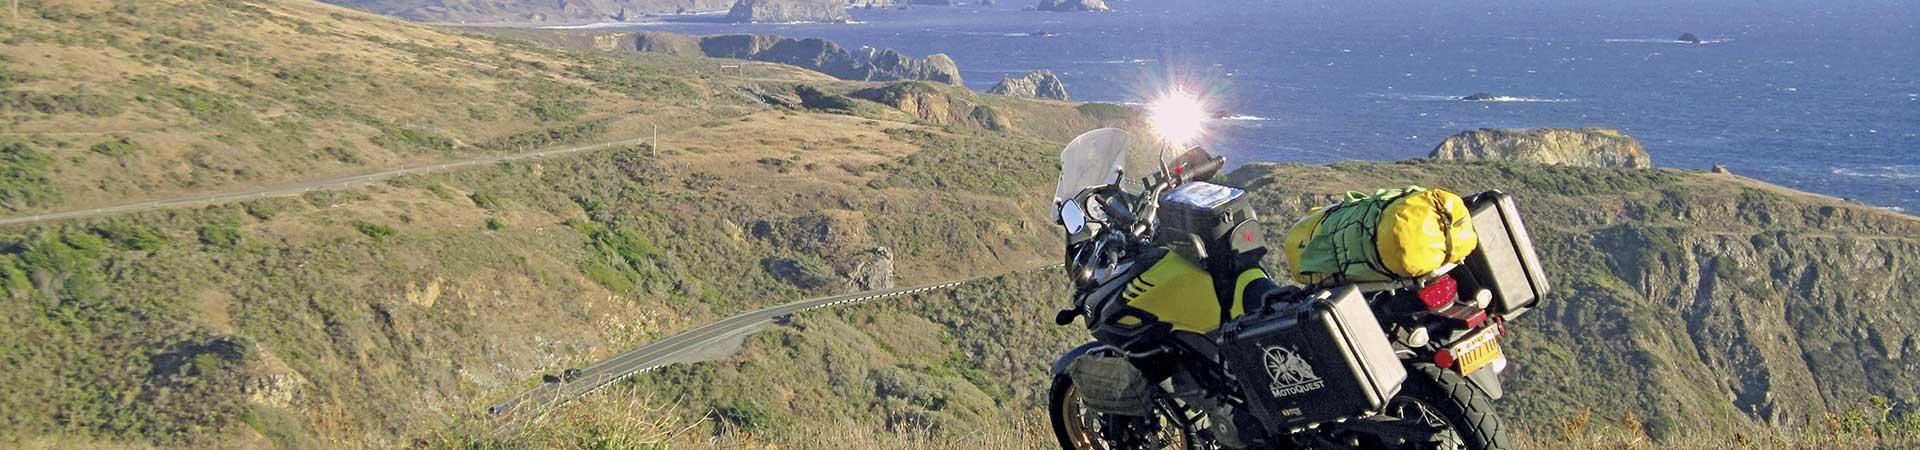 Motorradtour USA Südwesten